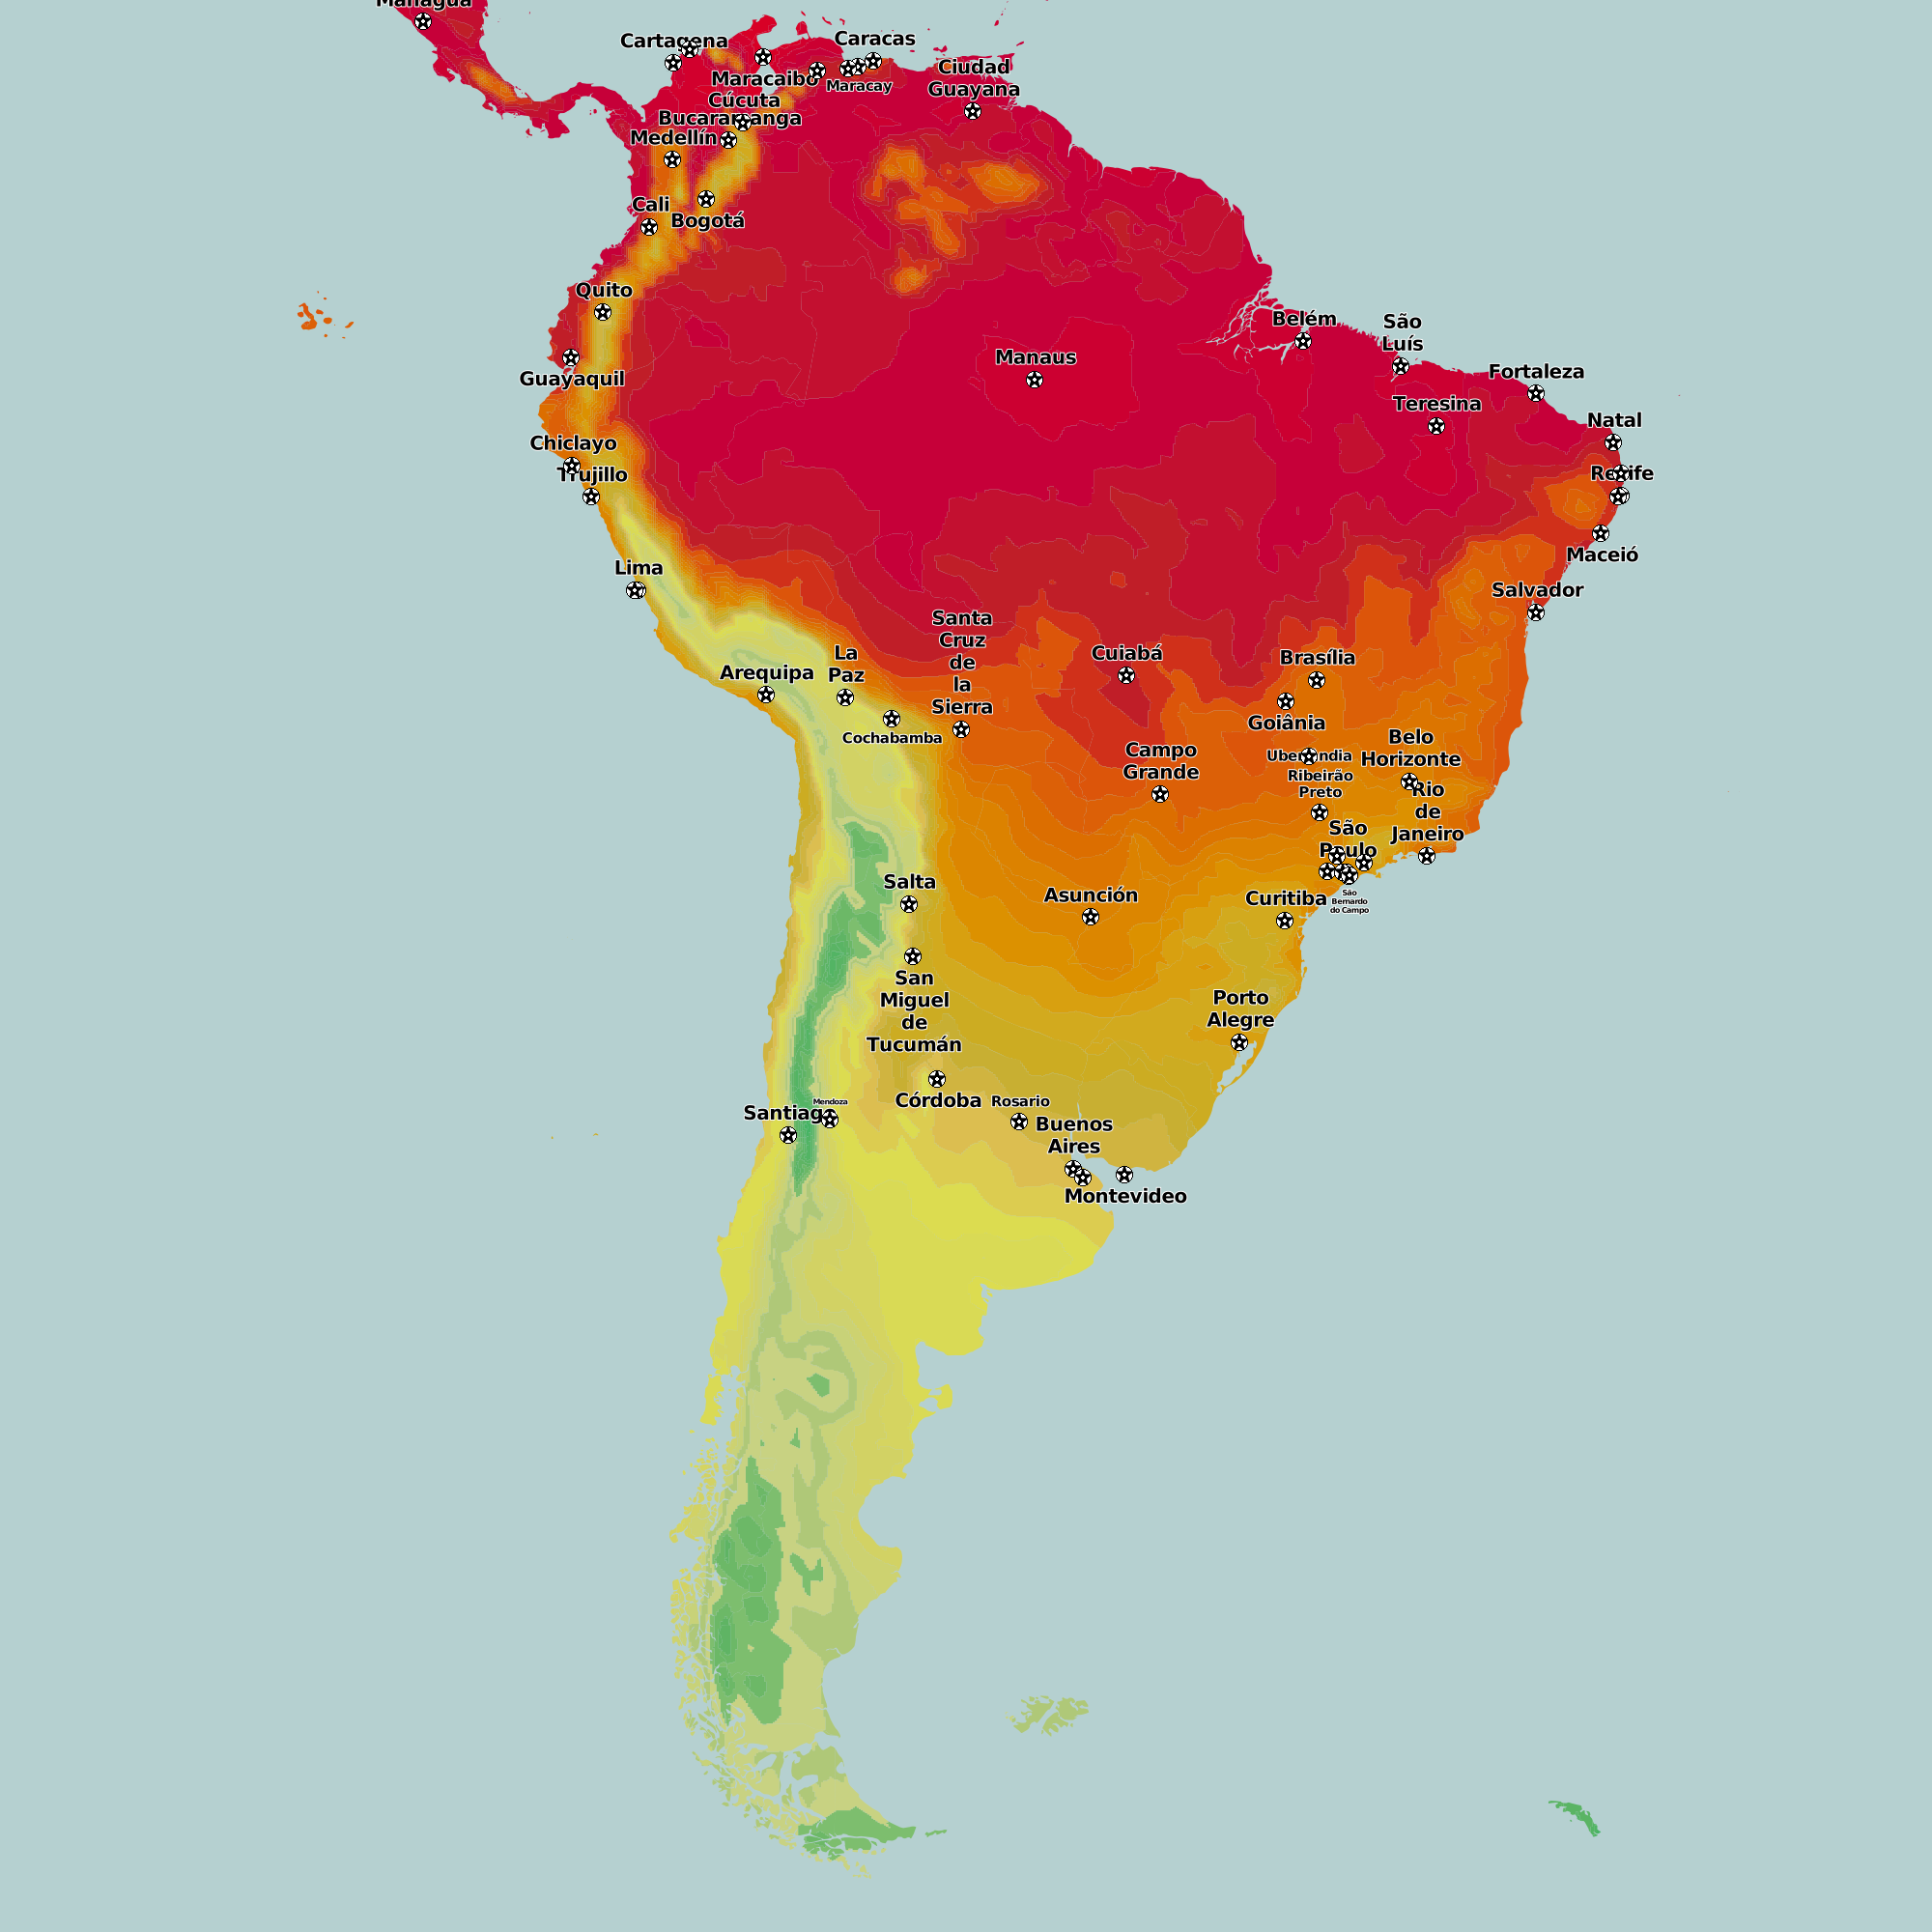 stromausfall südamerika - HD2000×2000